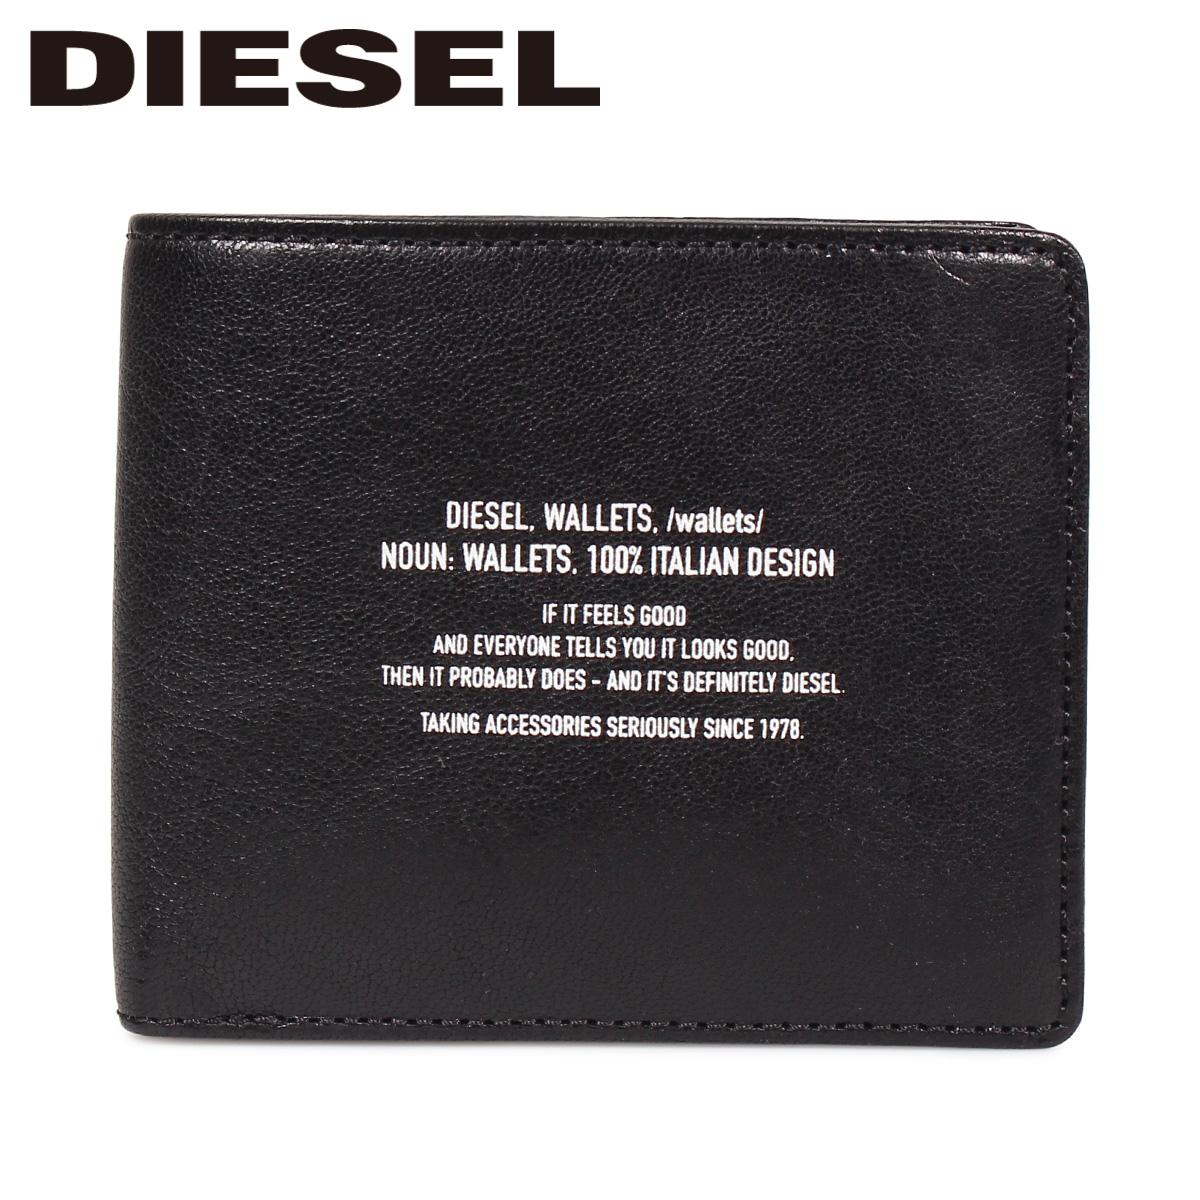 DIESEL BANDER HIRESH S ディーゼル 財布 二つ折り メンズ 本革 ブラック 黒 X06295 PS142